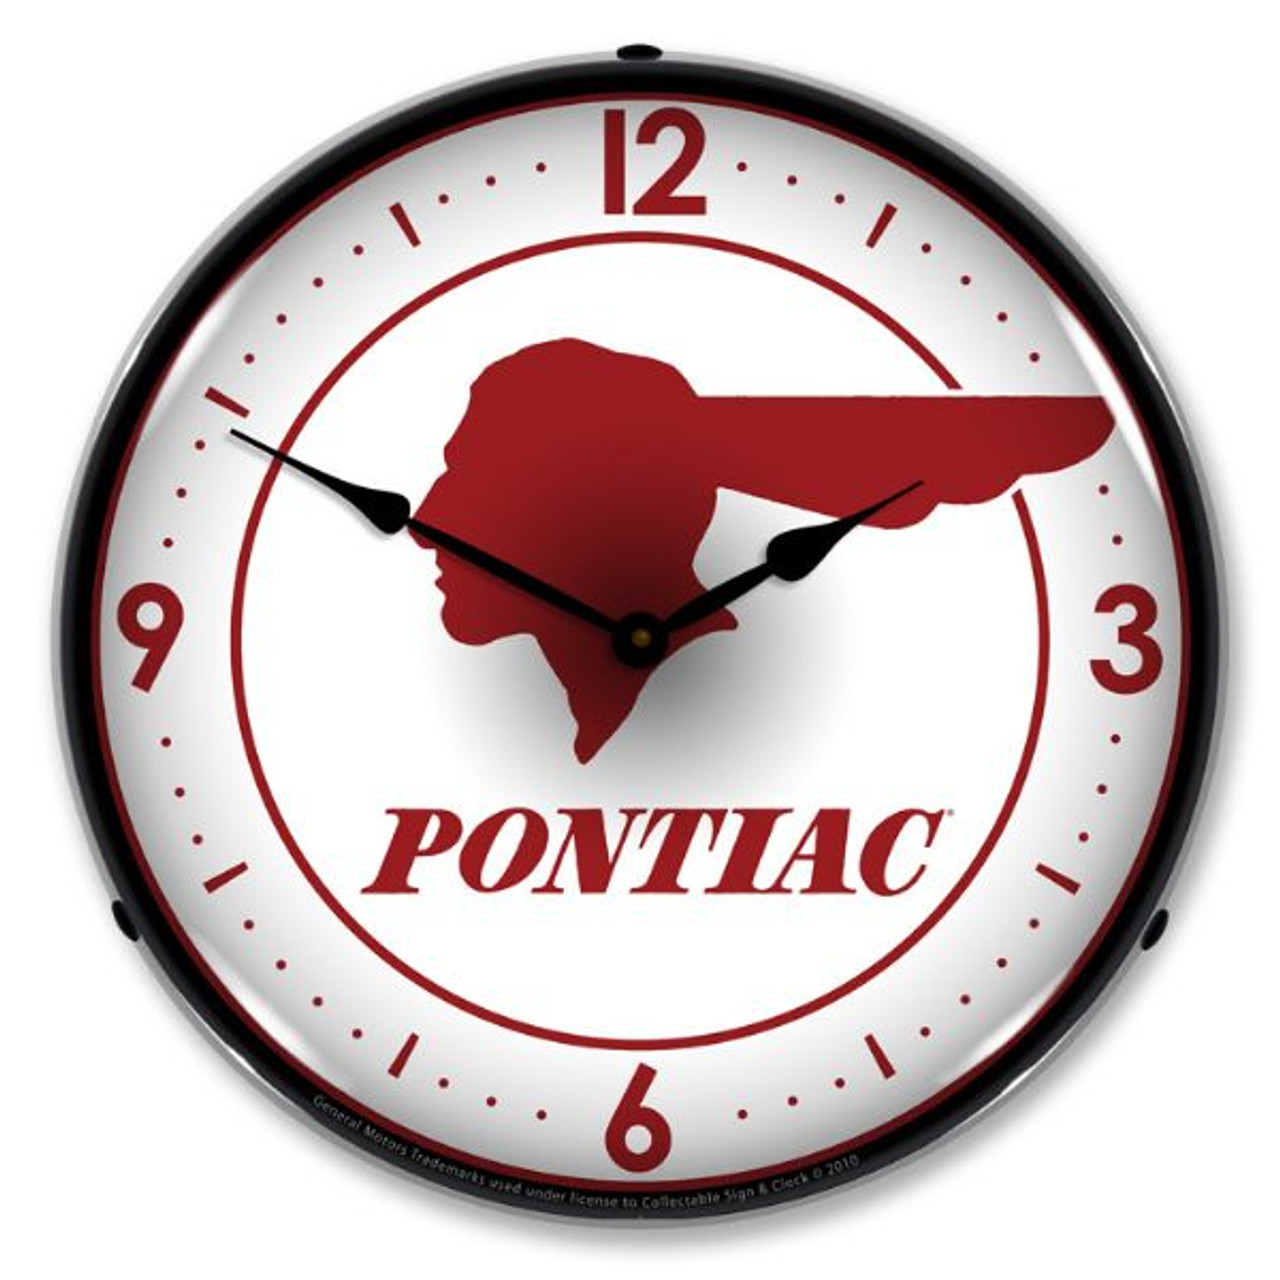 Pontiac Indian Lighted Wall Clock